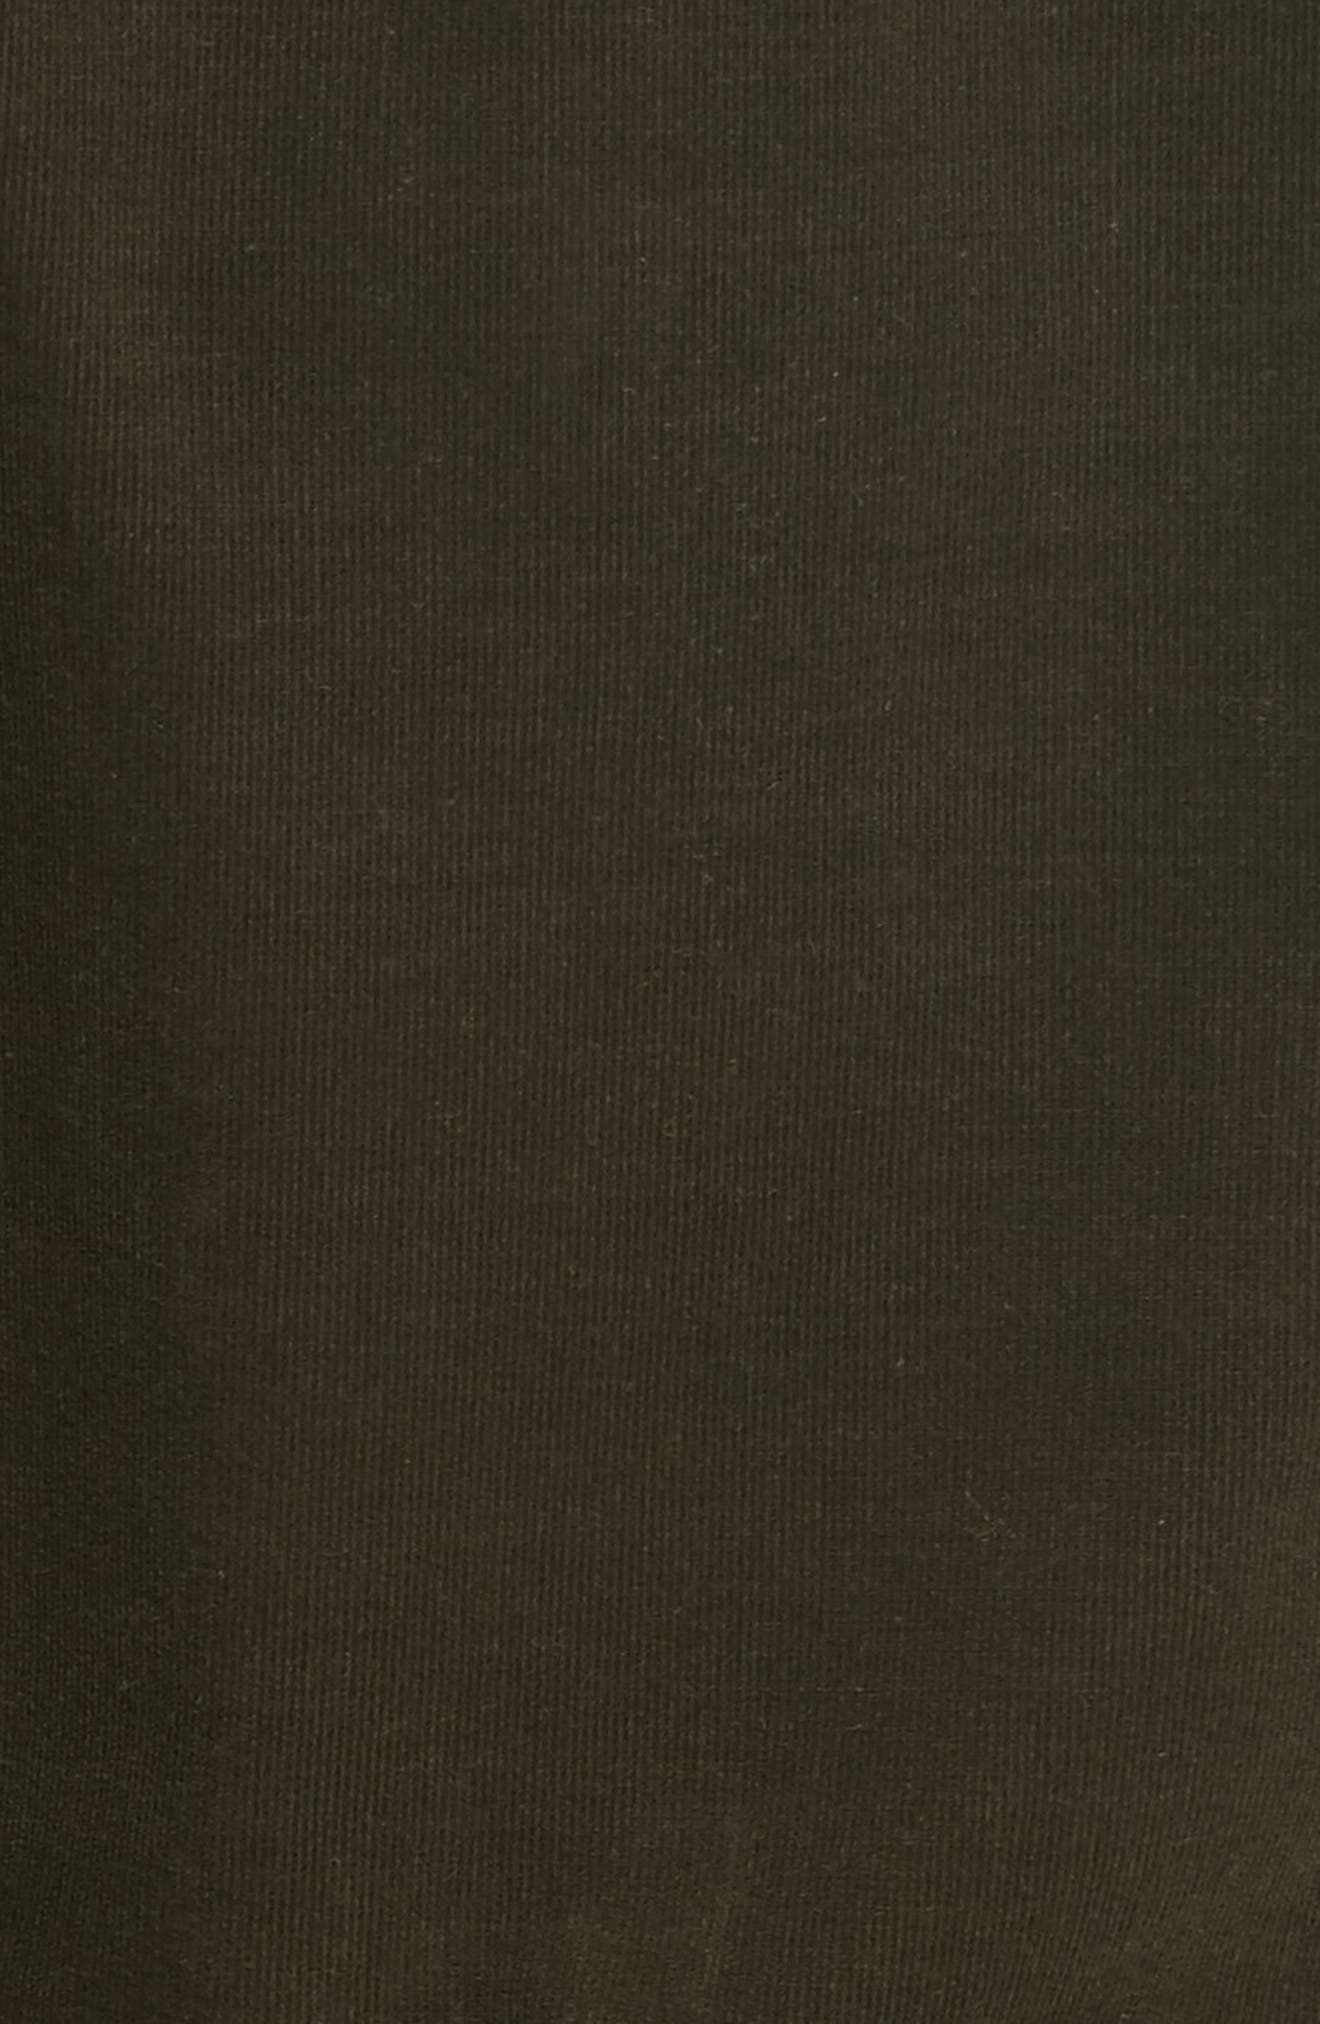 Britton Corduroy Shirtdress,                             Alternate thumbnail 5, color,                             Army Green